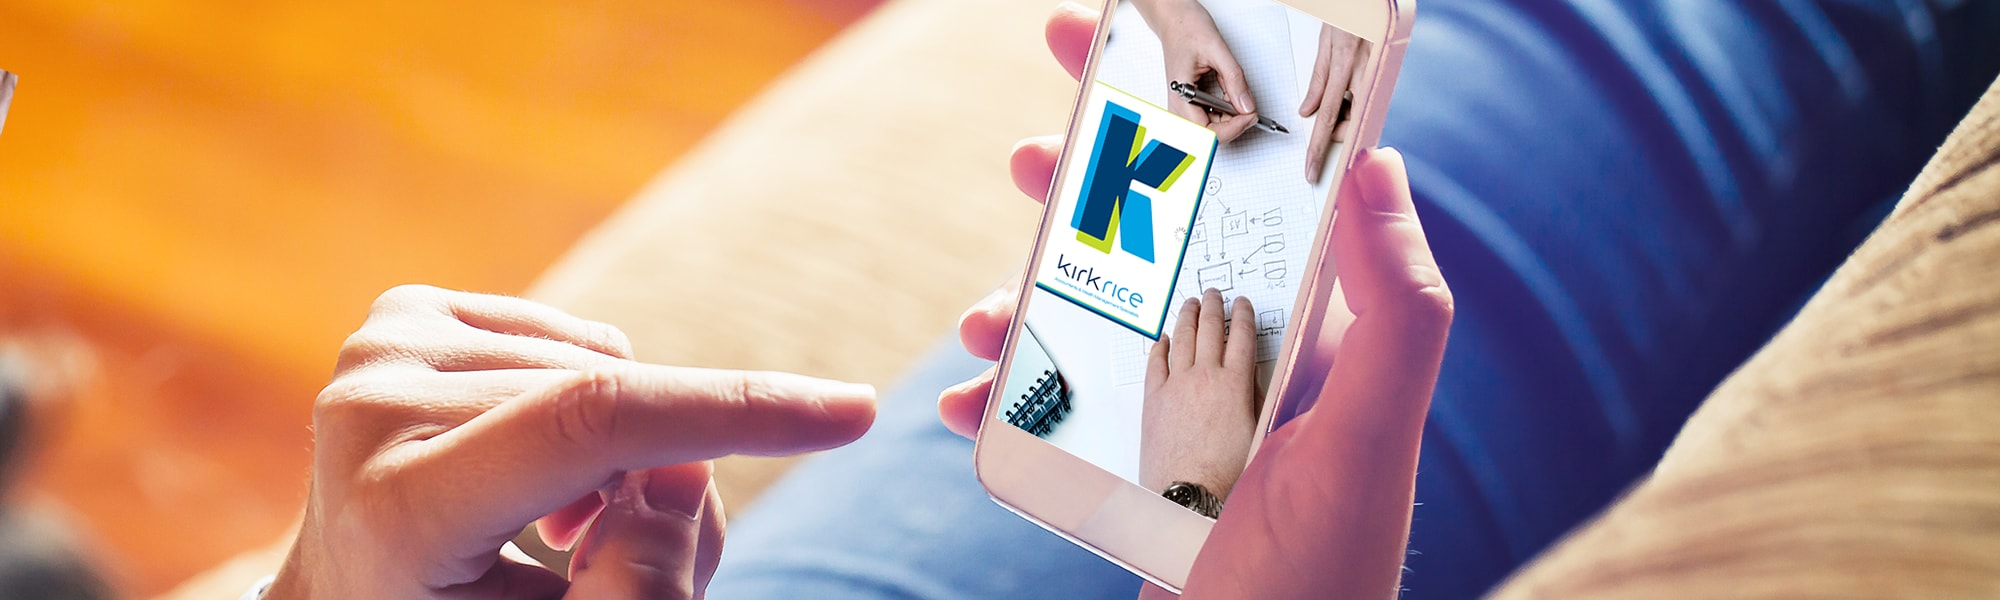 Kirk Rice Accountancy App – Download Here